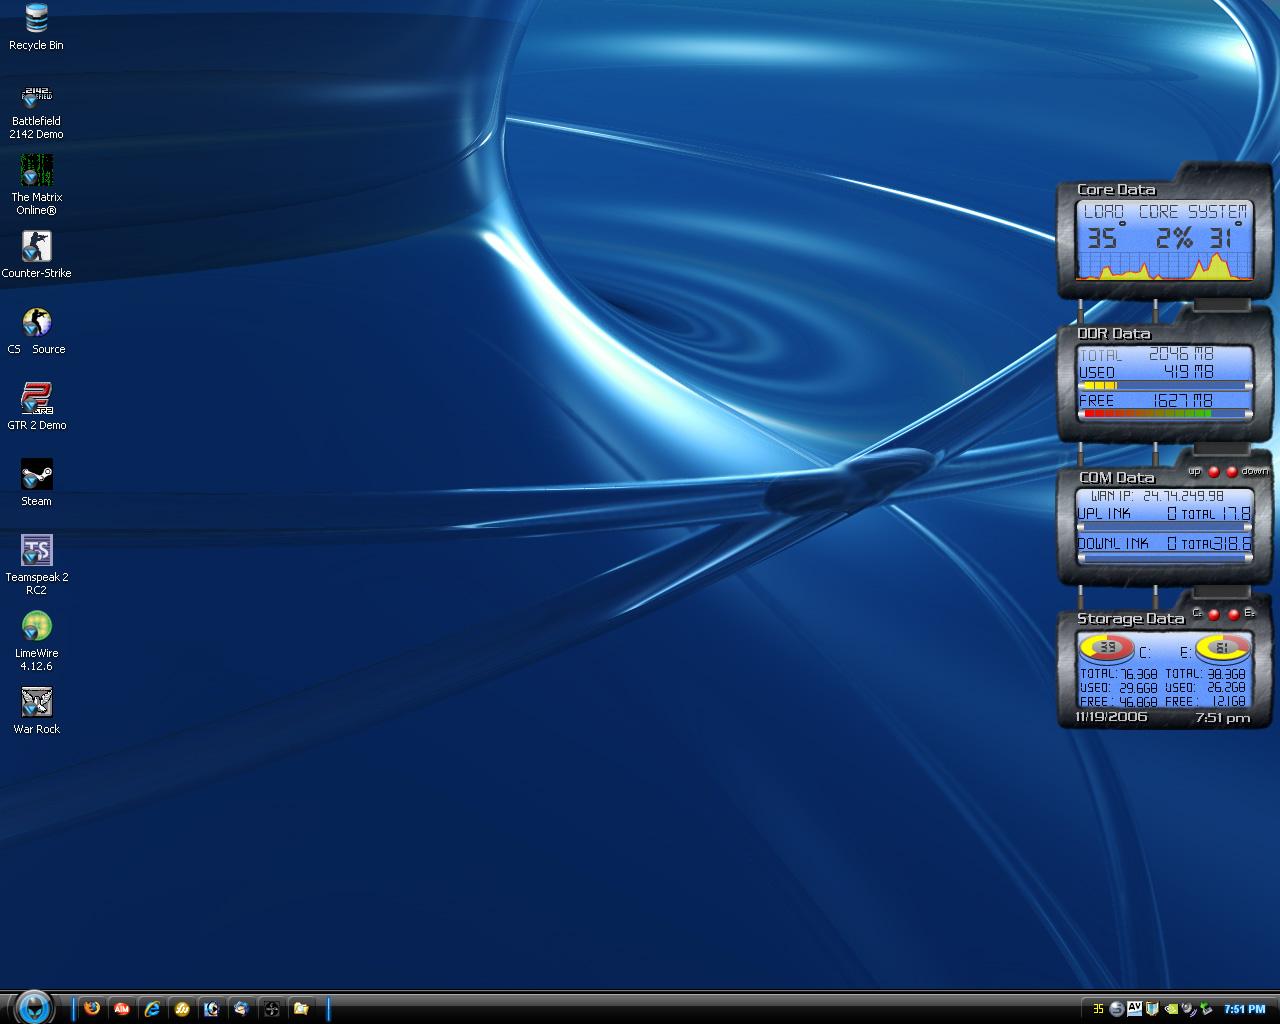 Title: Razor Modz Desktop